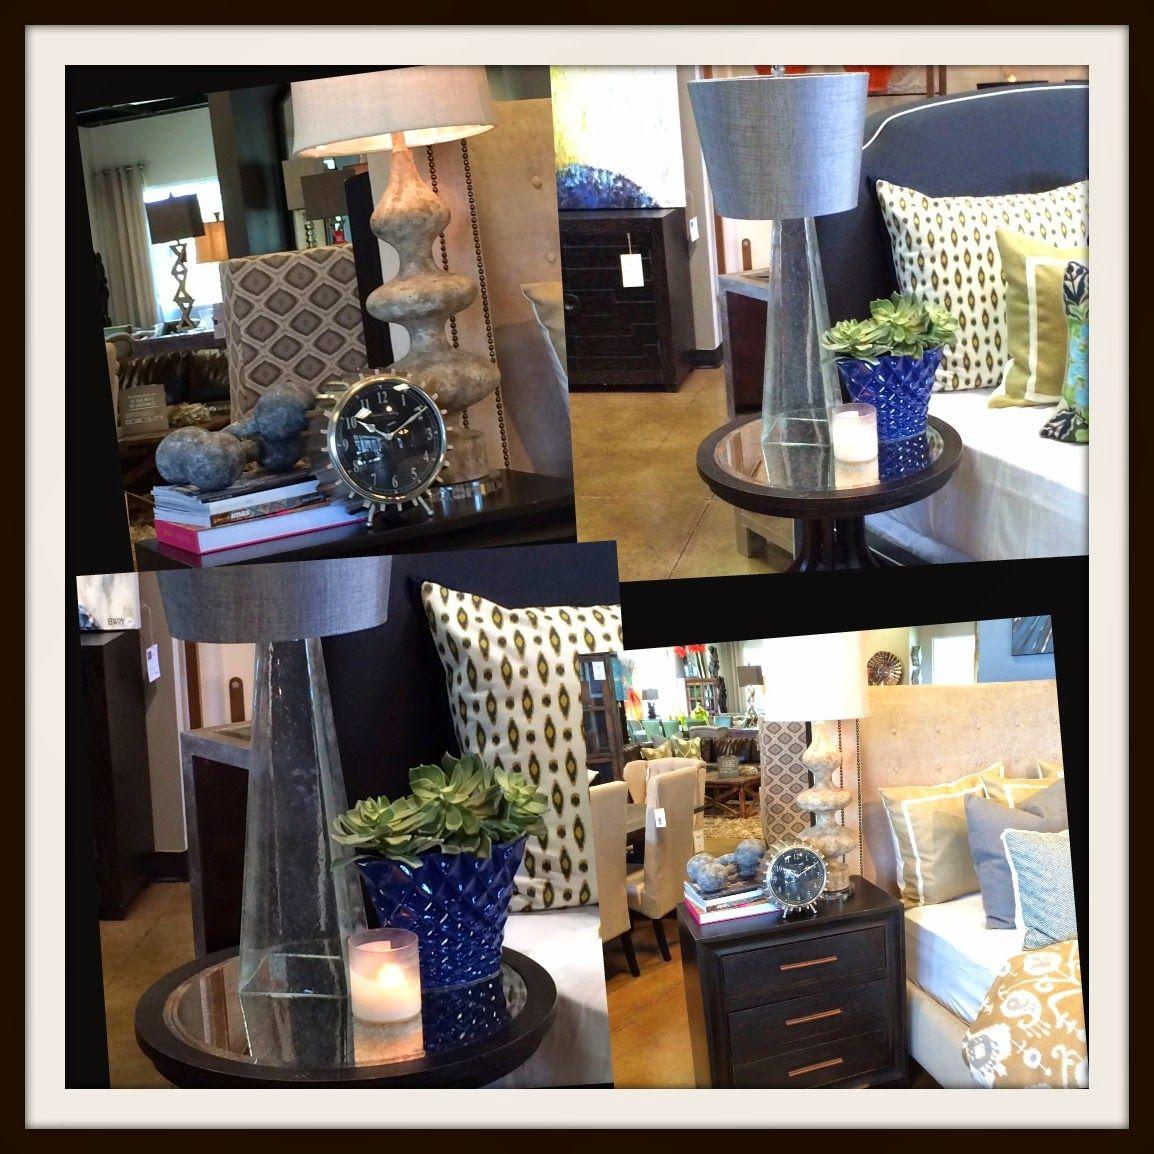 How to Decorate a Nightstand | Hello Metro Blog - I.O. Metro #interiordesign #myio #nightstand #decoratingnightstand